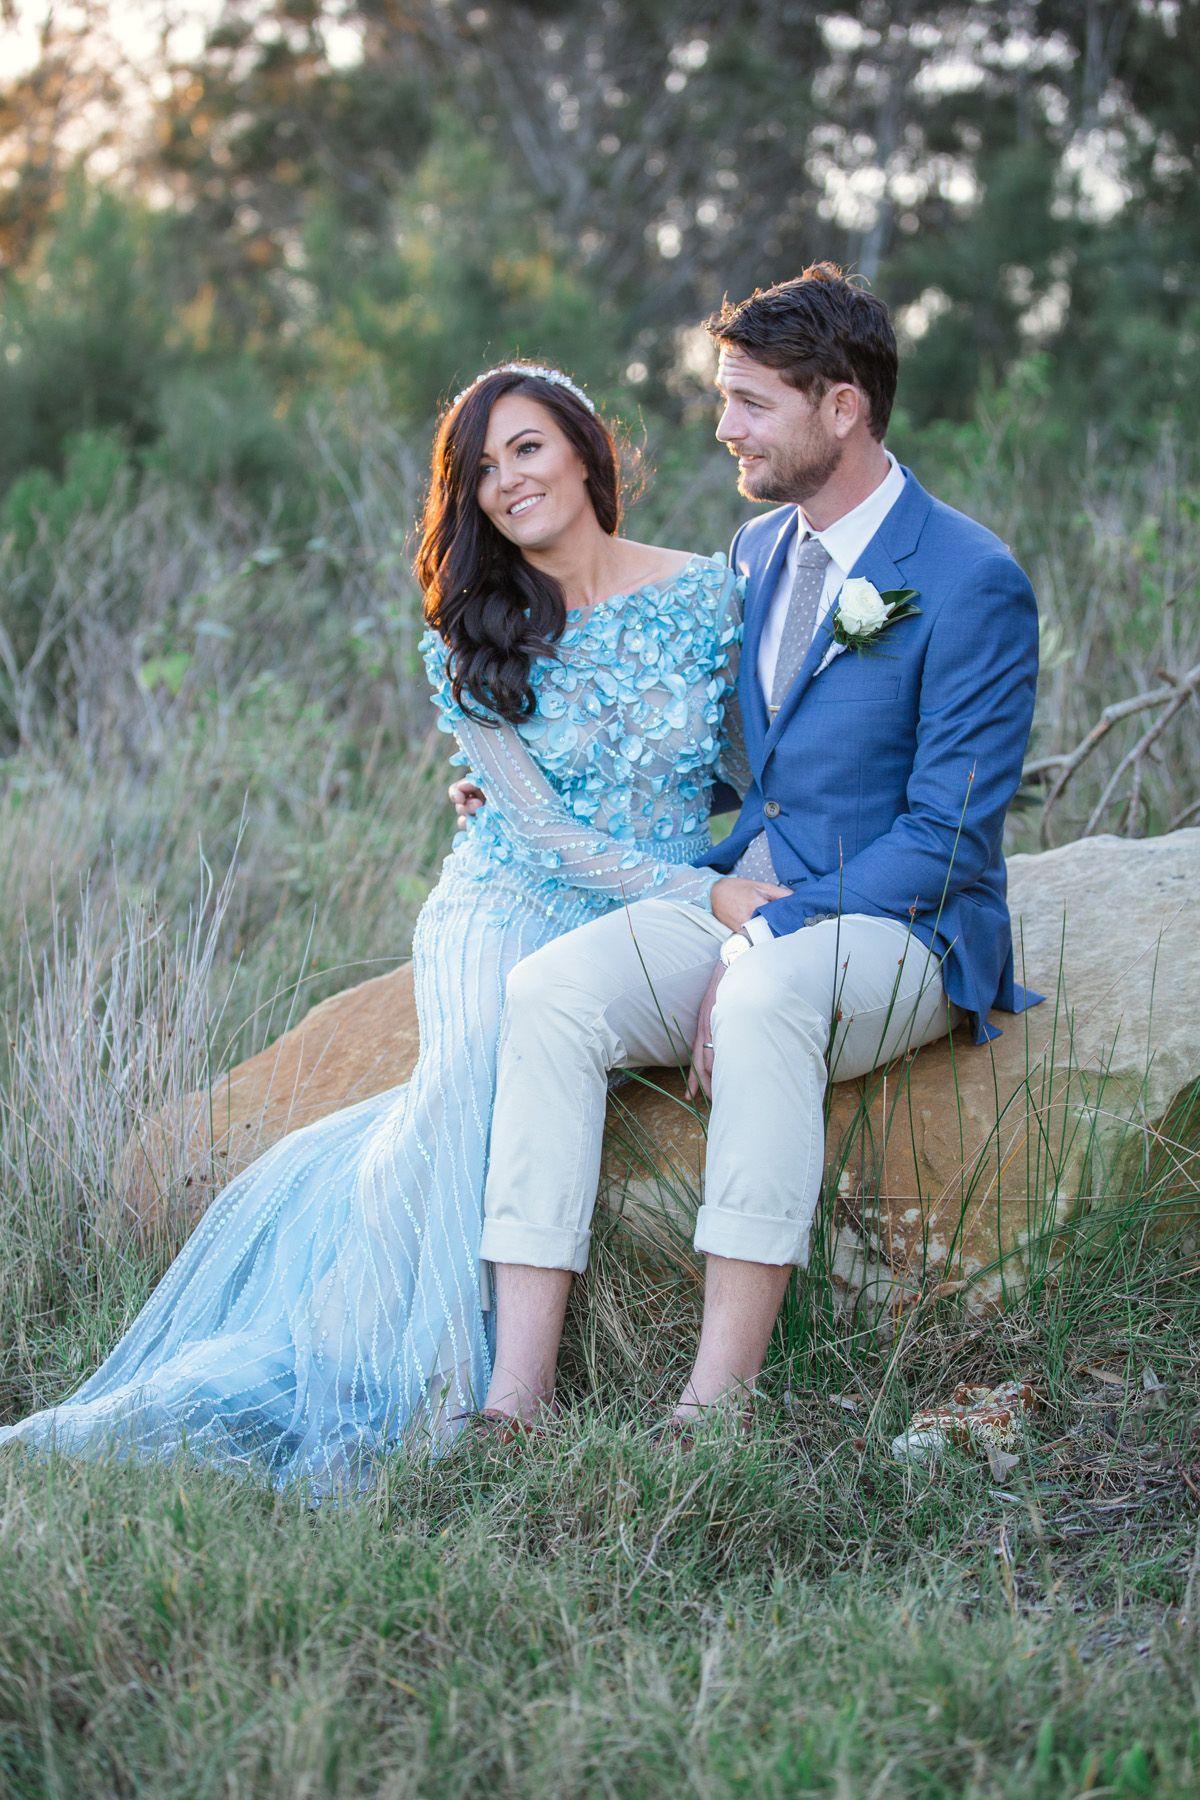 Waterside White Wedding In Yamba - Polka Dot Bride